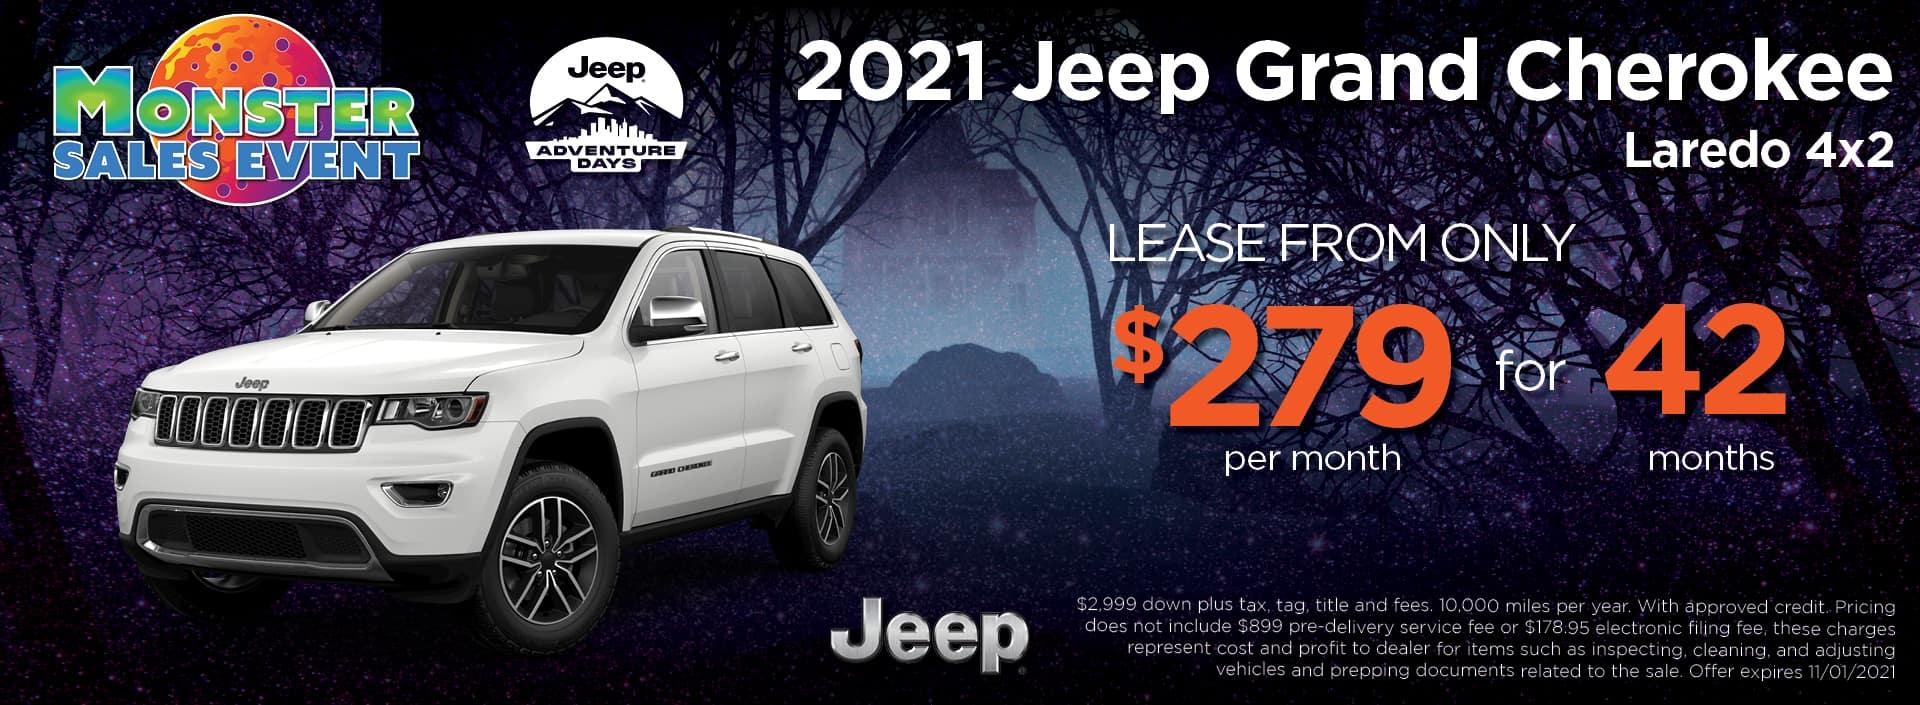 21 Jeep Grand Cherokee 279 42mos